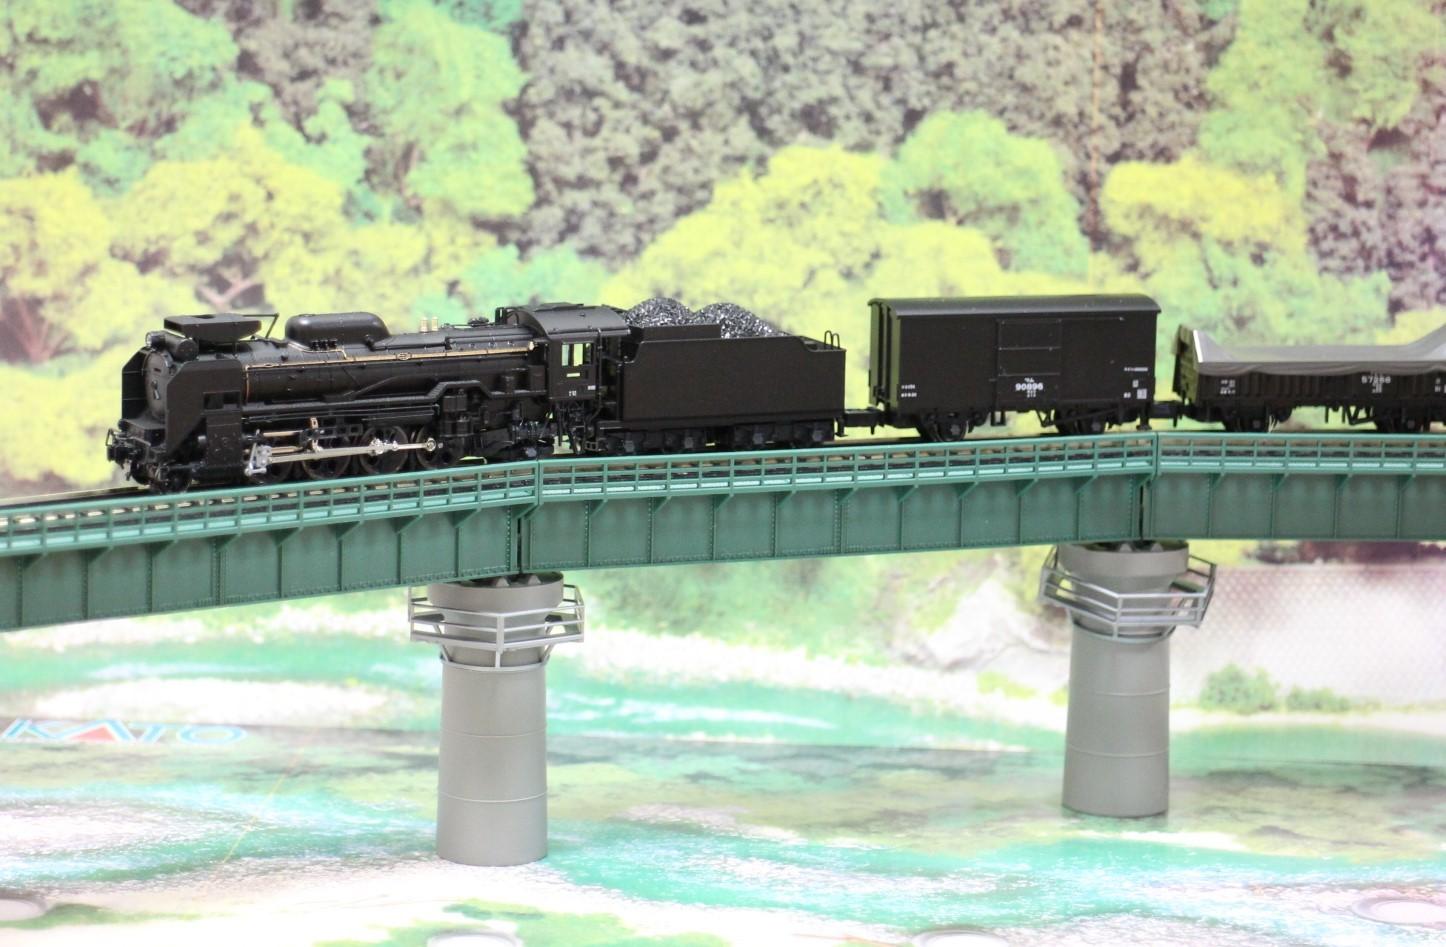 KATO のカーブ鉄橋セットを使い楽しんでみる!_a0149148_10322003.jpg